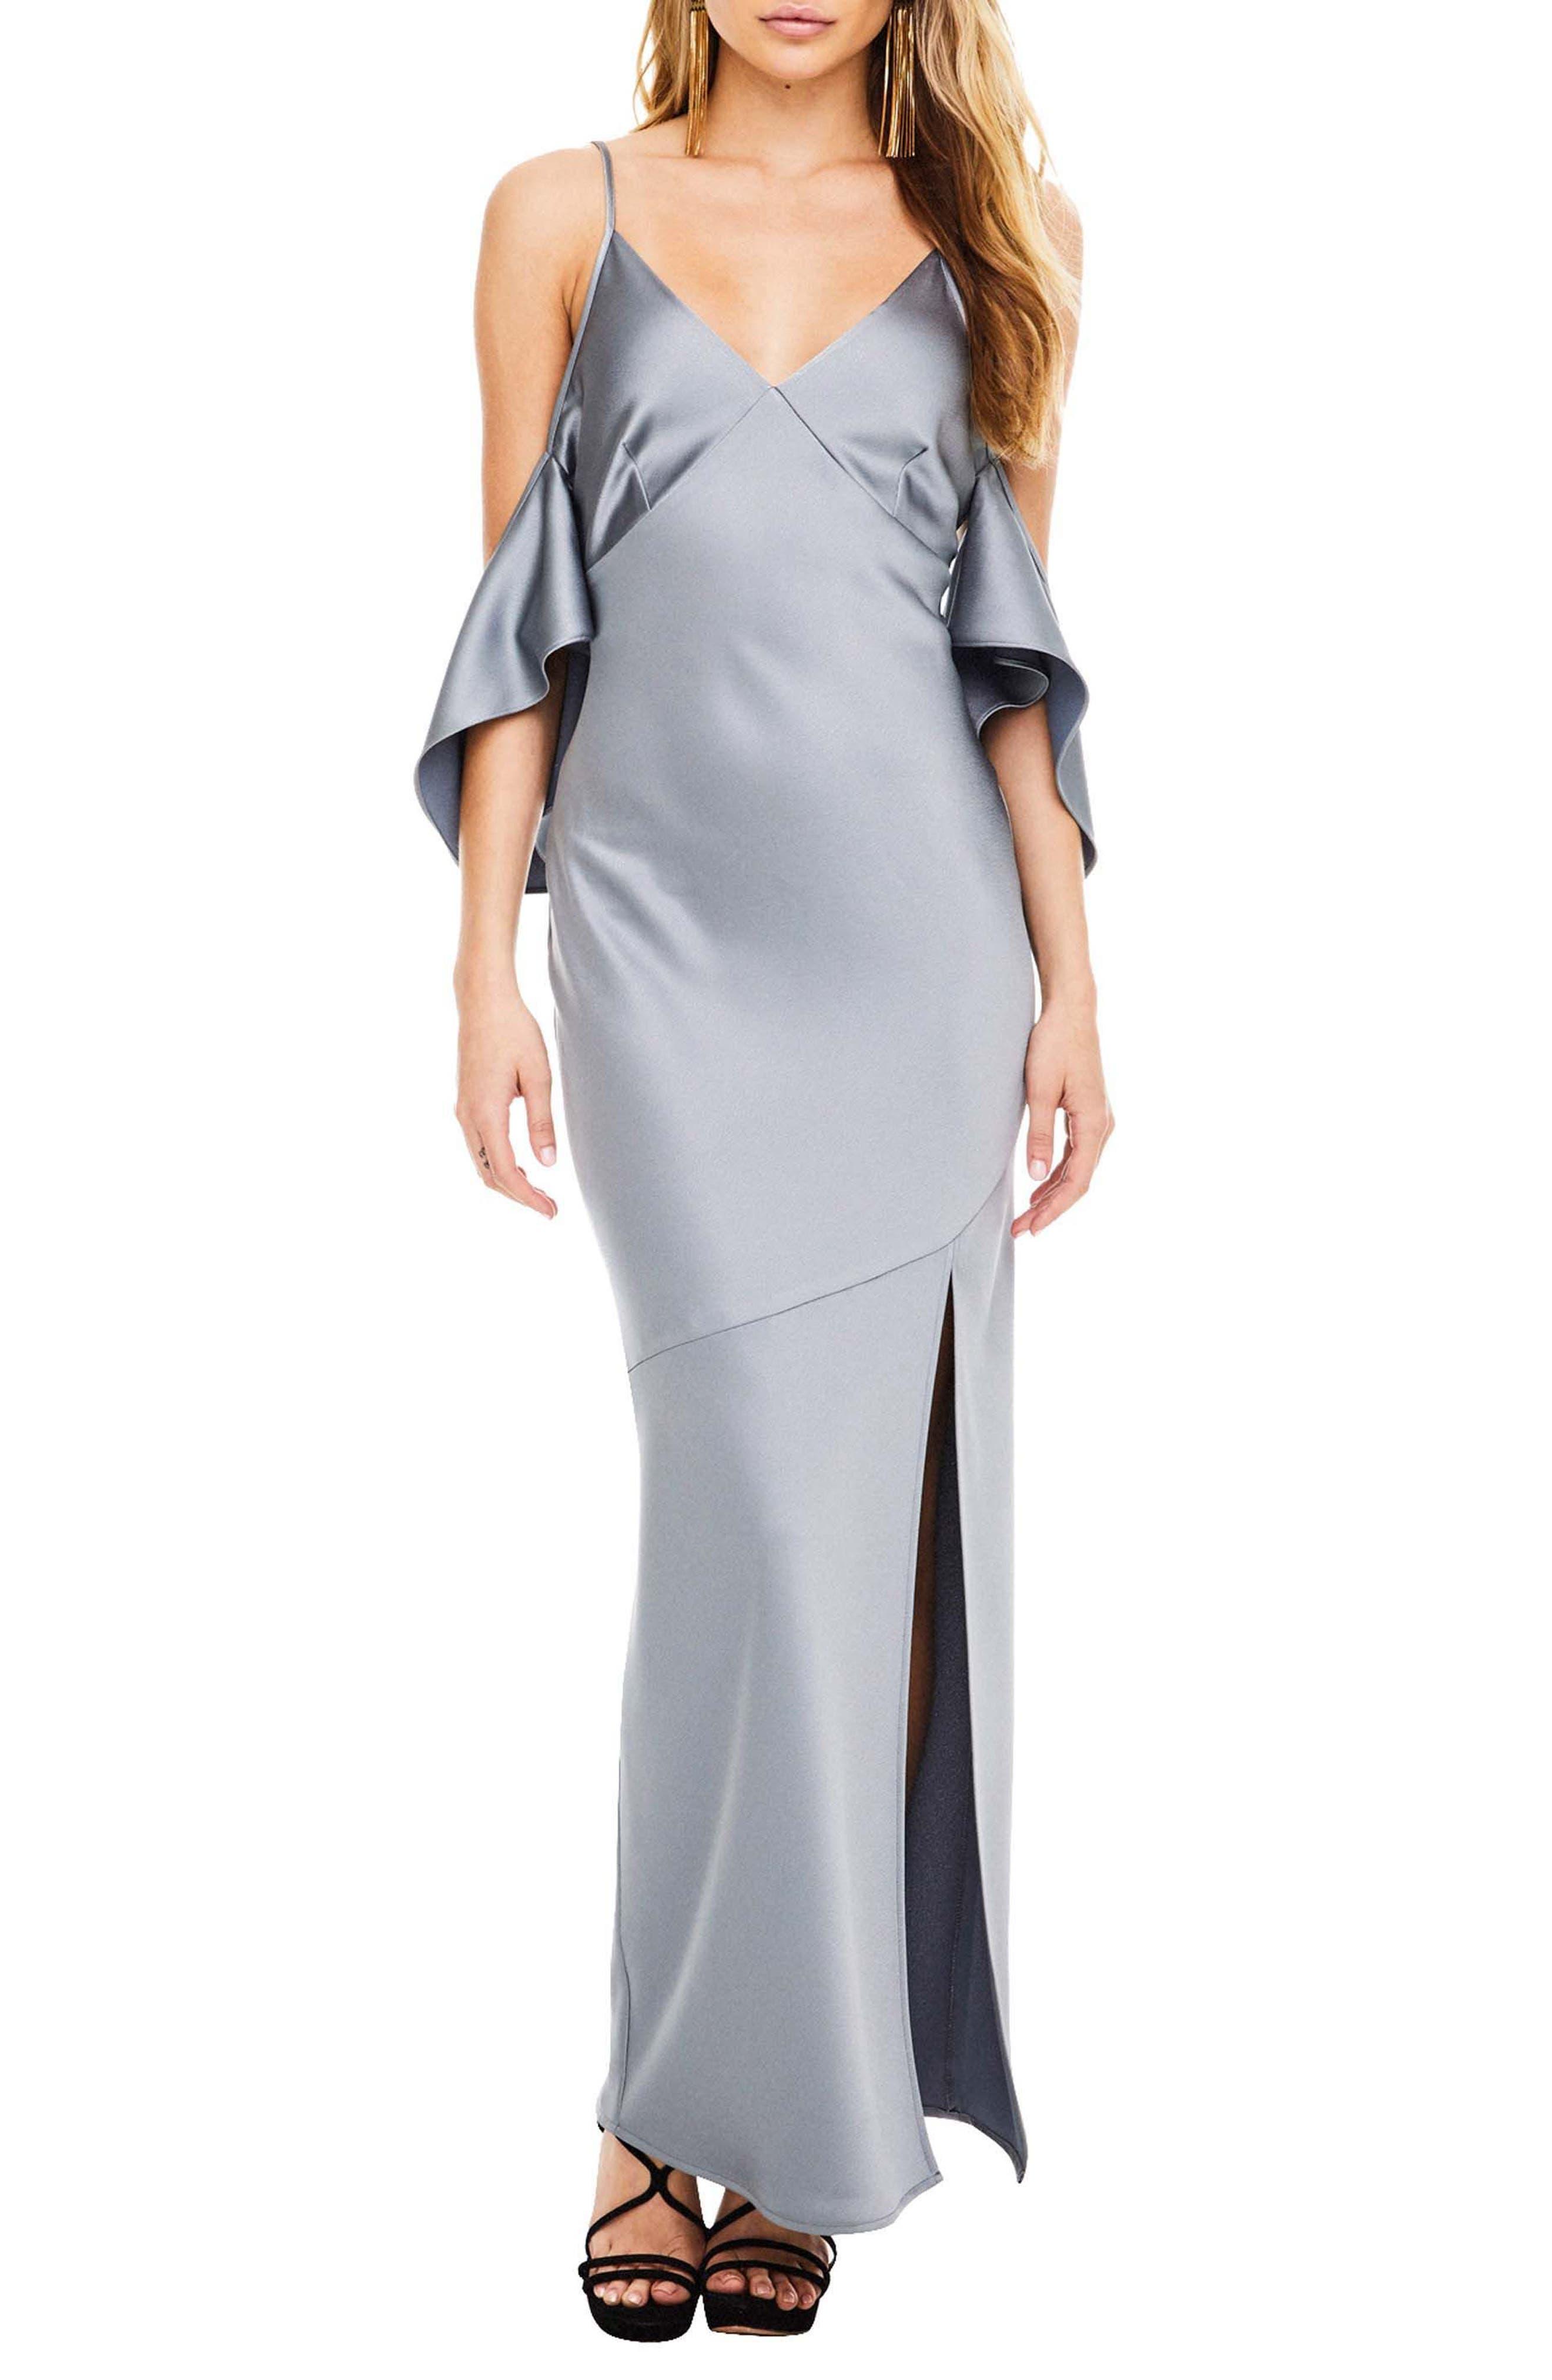 Kendra Maxi Dress,                             Main thumbnail 2, color,